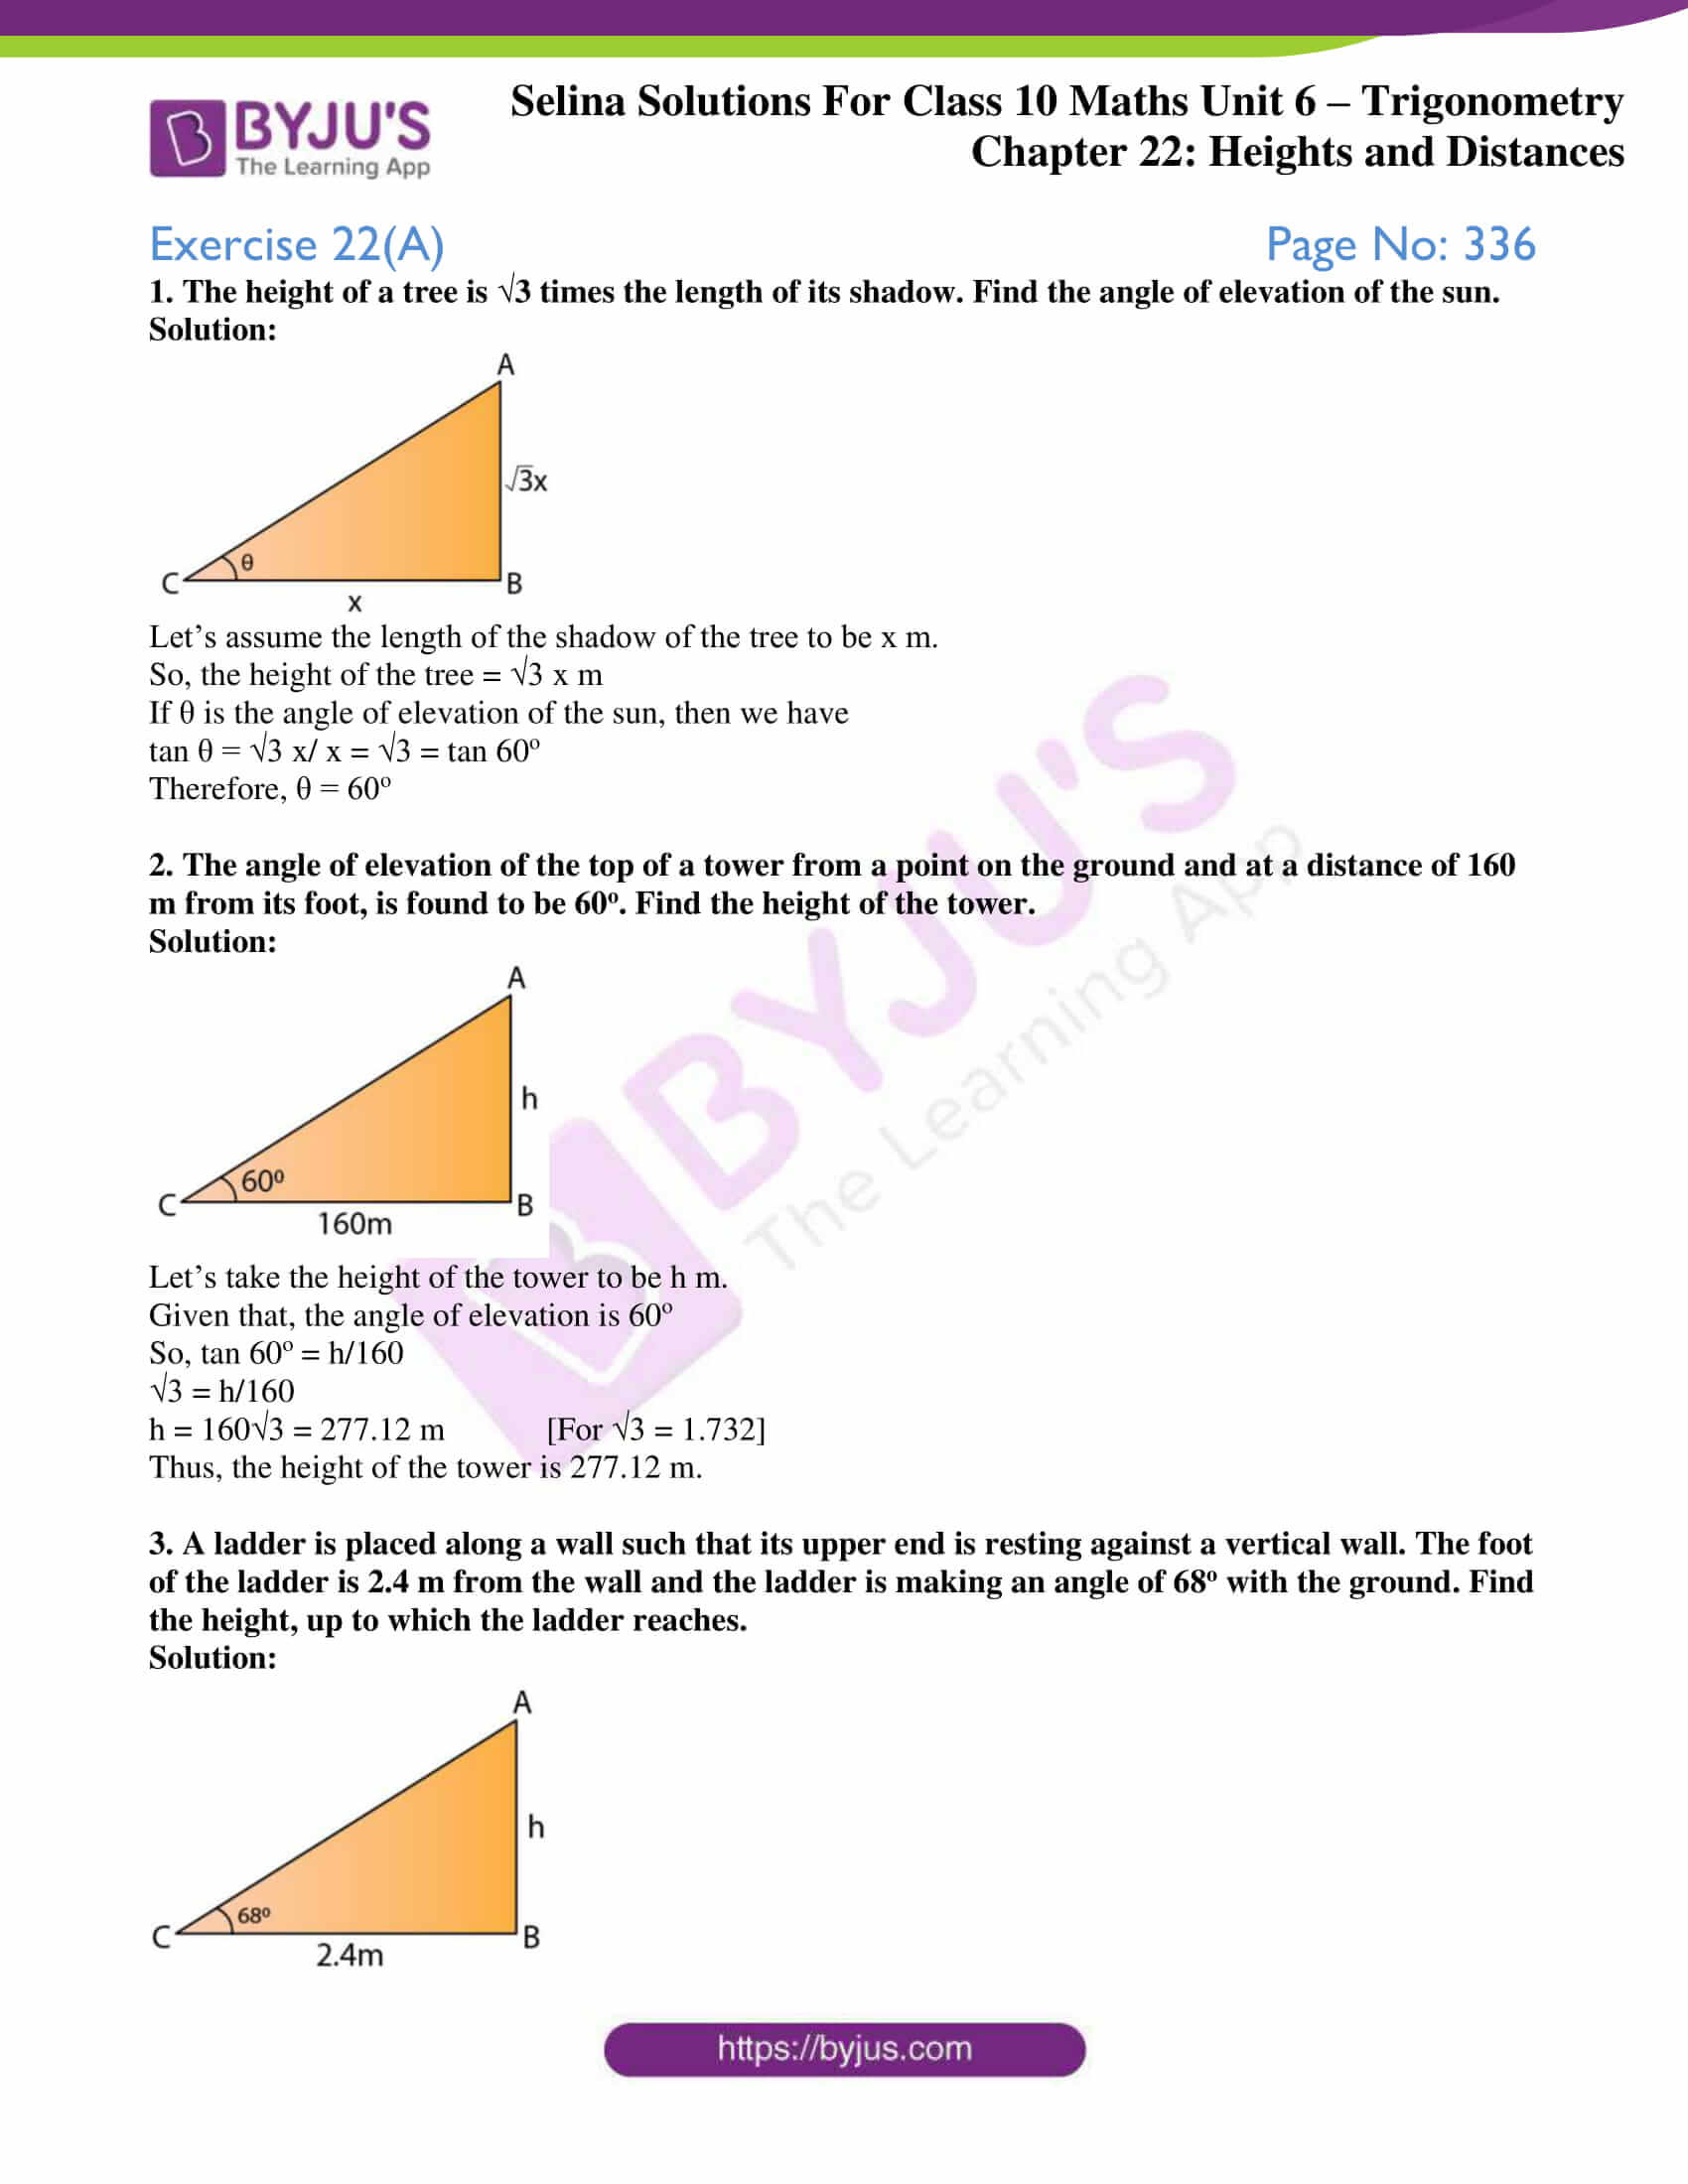 selina-sol-maths-class-10-ch-22-ex-a-1